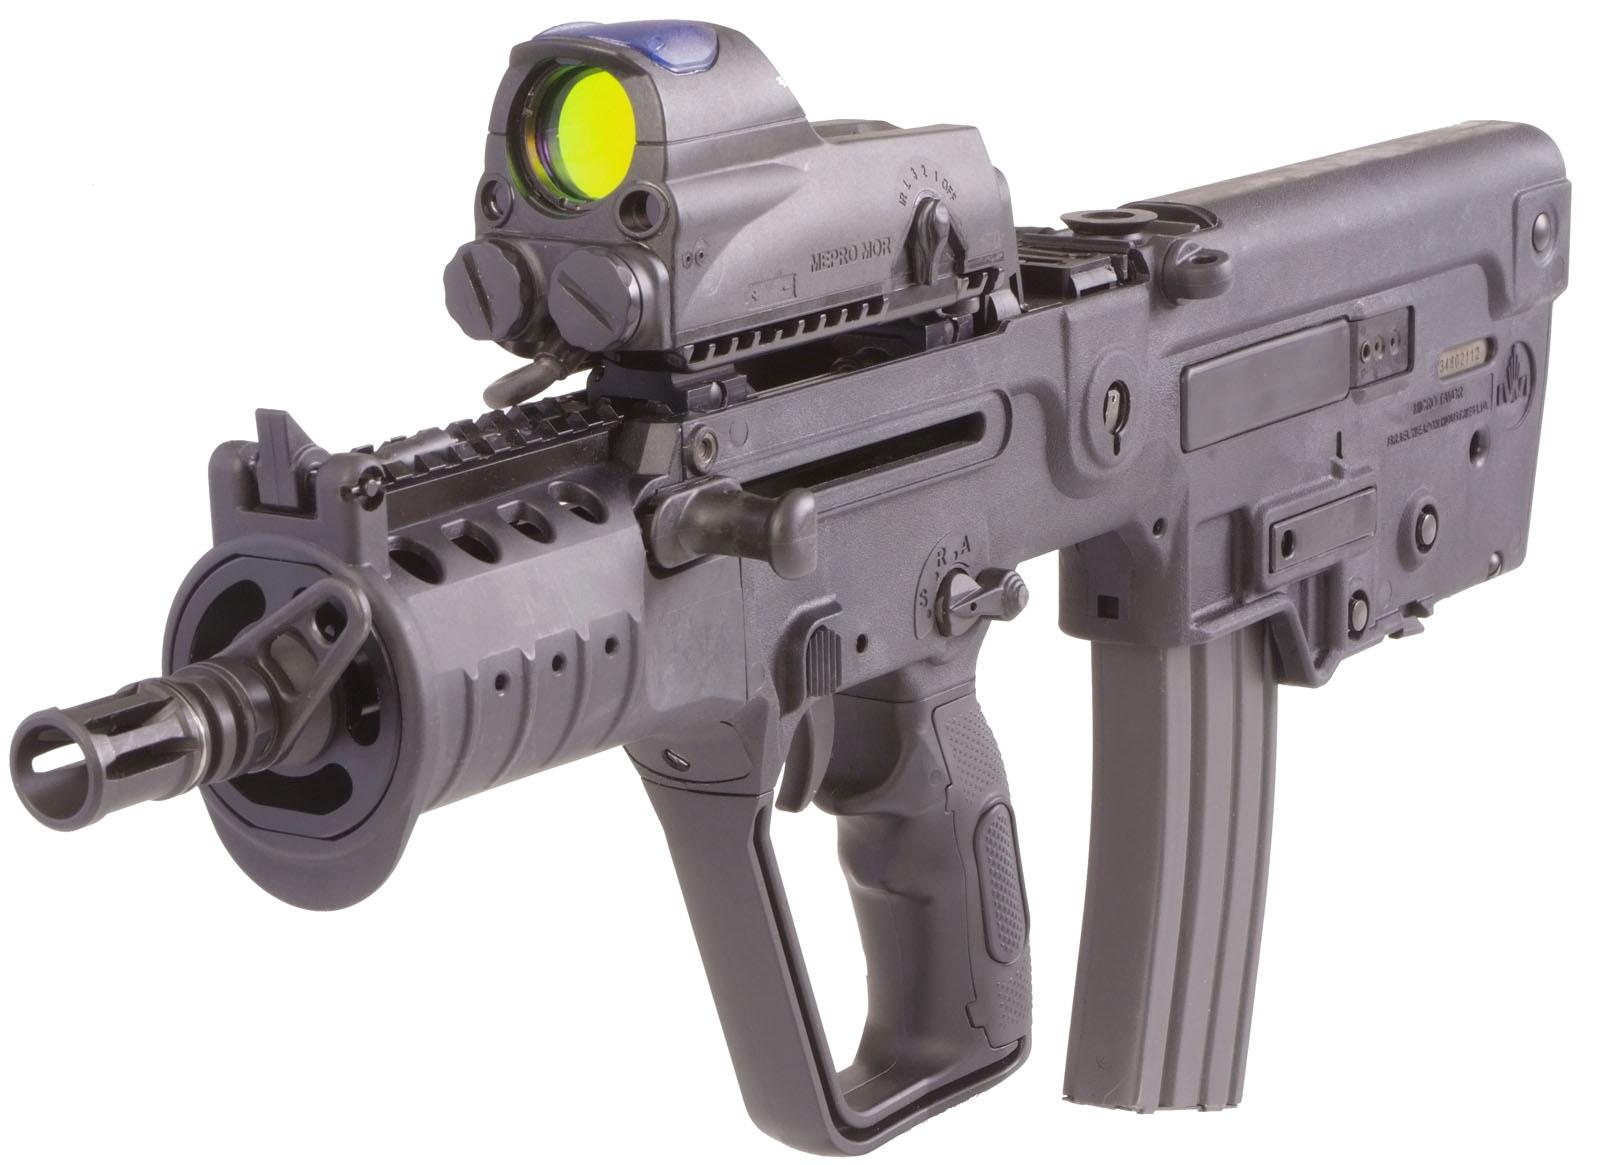 Sig Sauer Iphone Wallpaper Uzi Imi Machine Guns Hd Wallpapers Military Wallbase